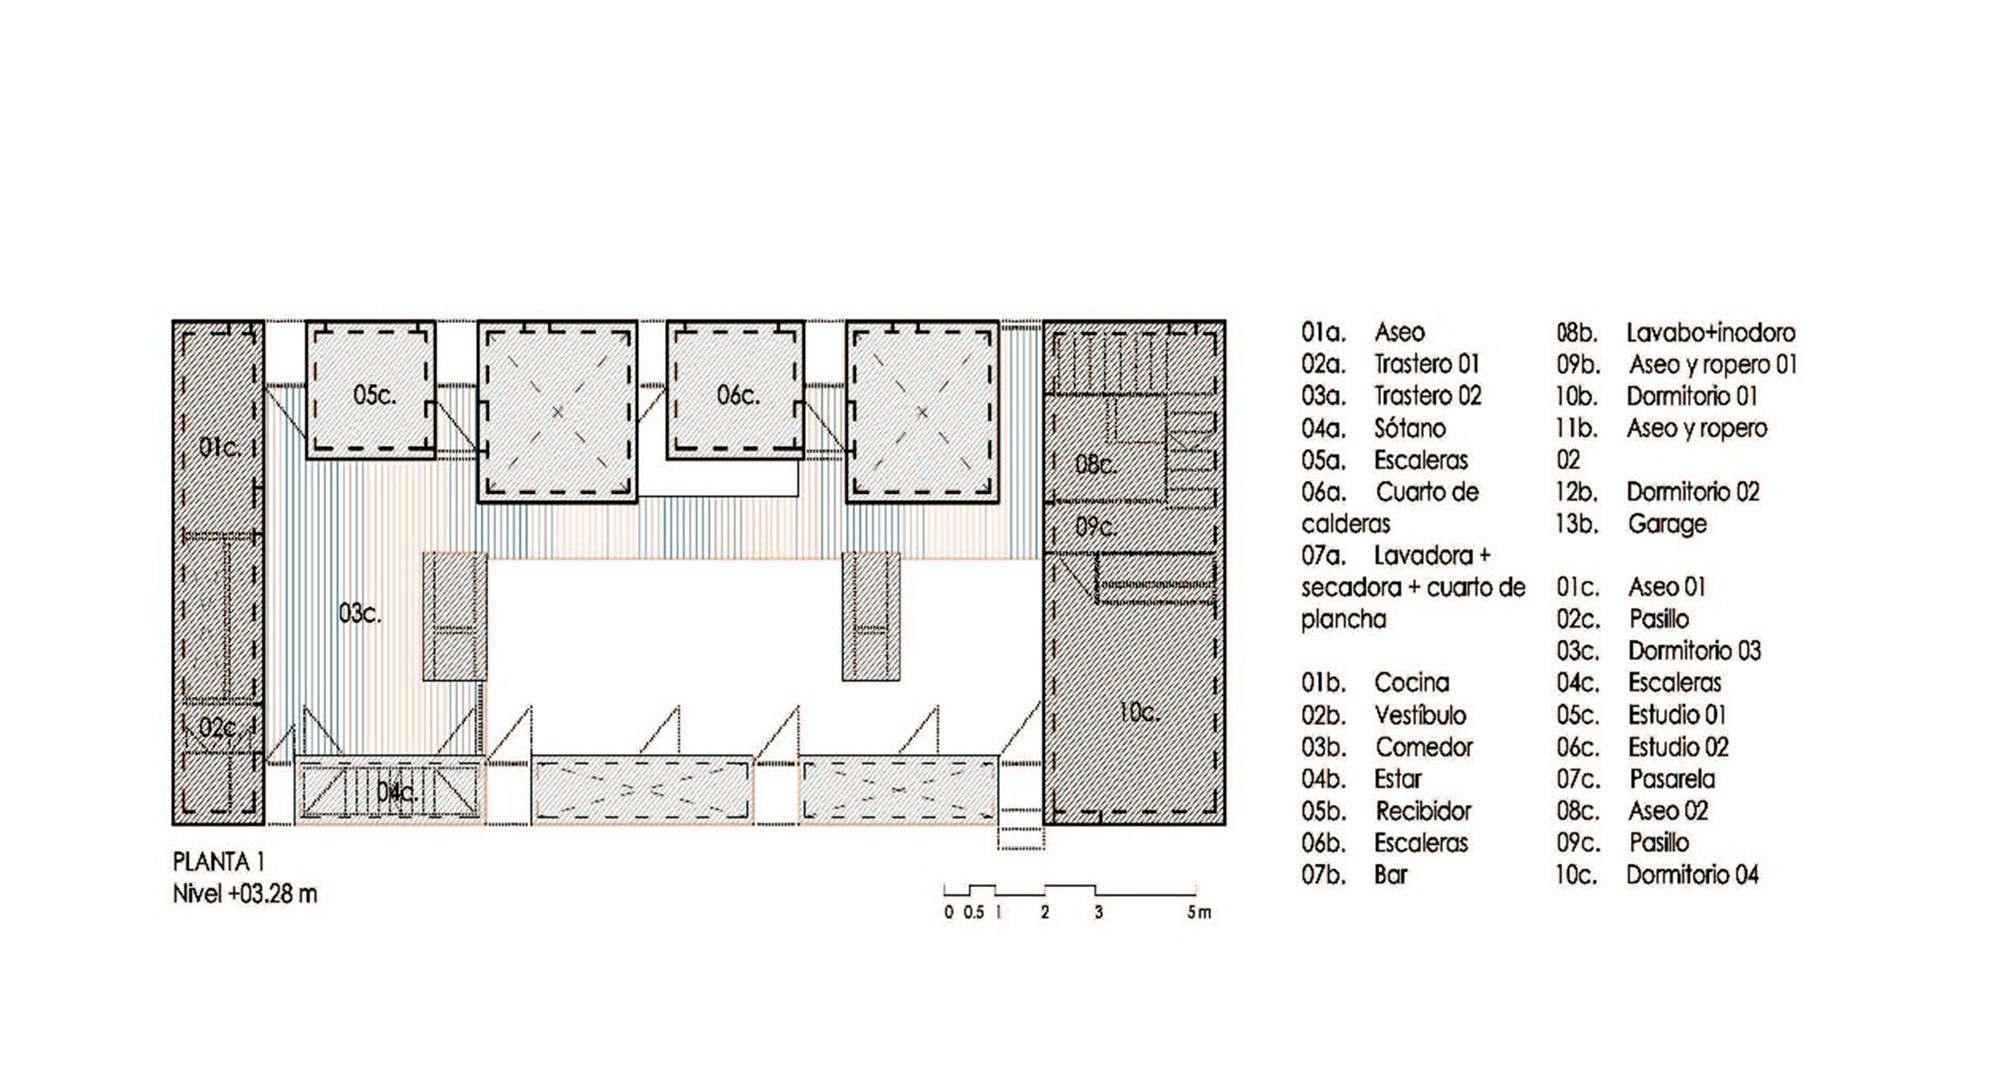 Galer a de vivienda entre medianeras casa fuensanta - Muka arquitectura ...